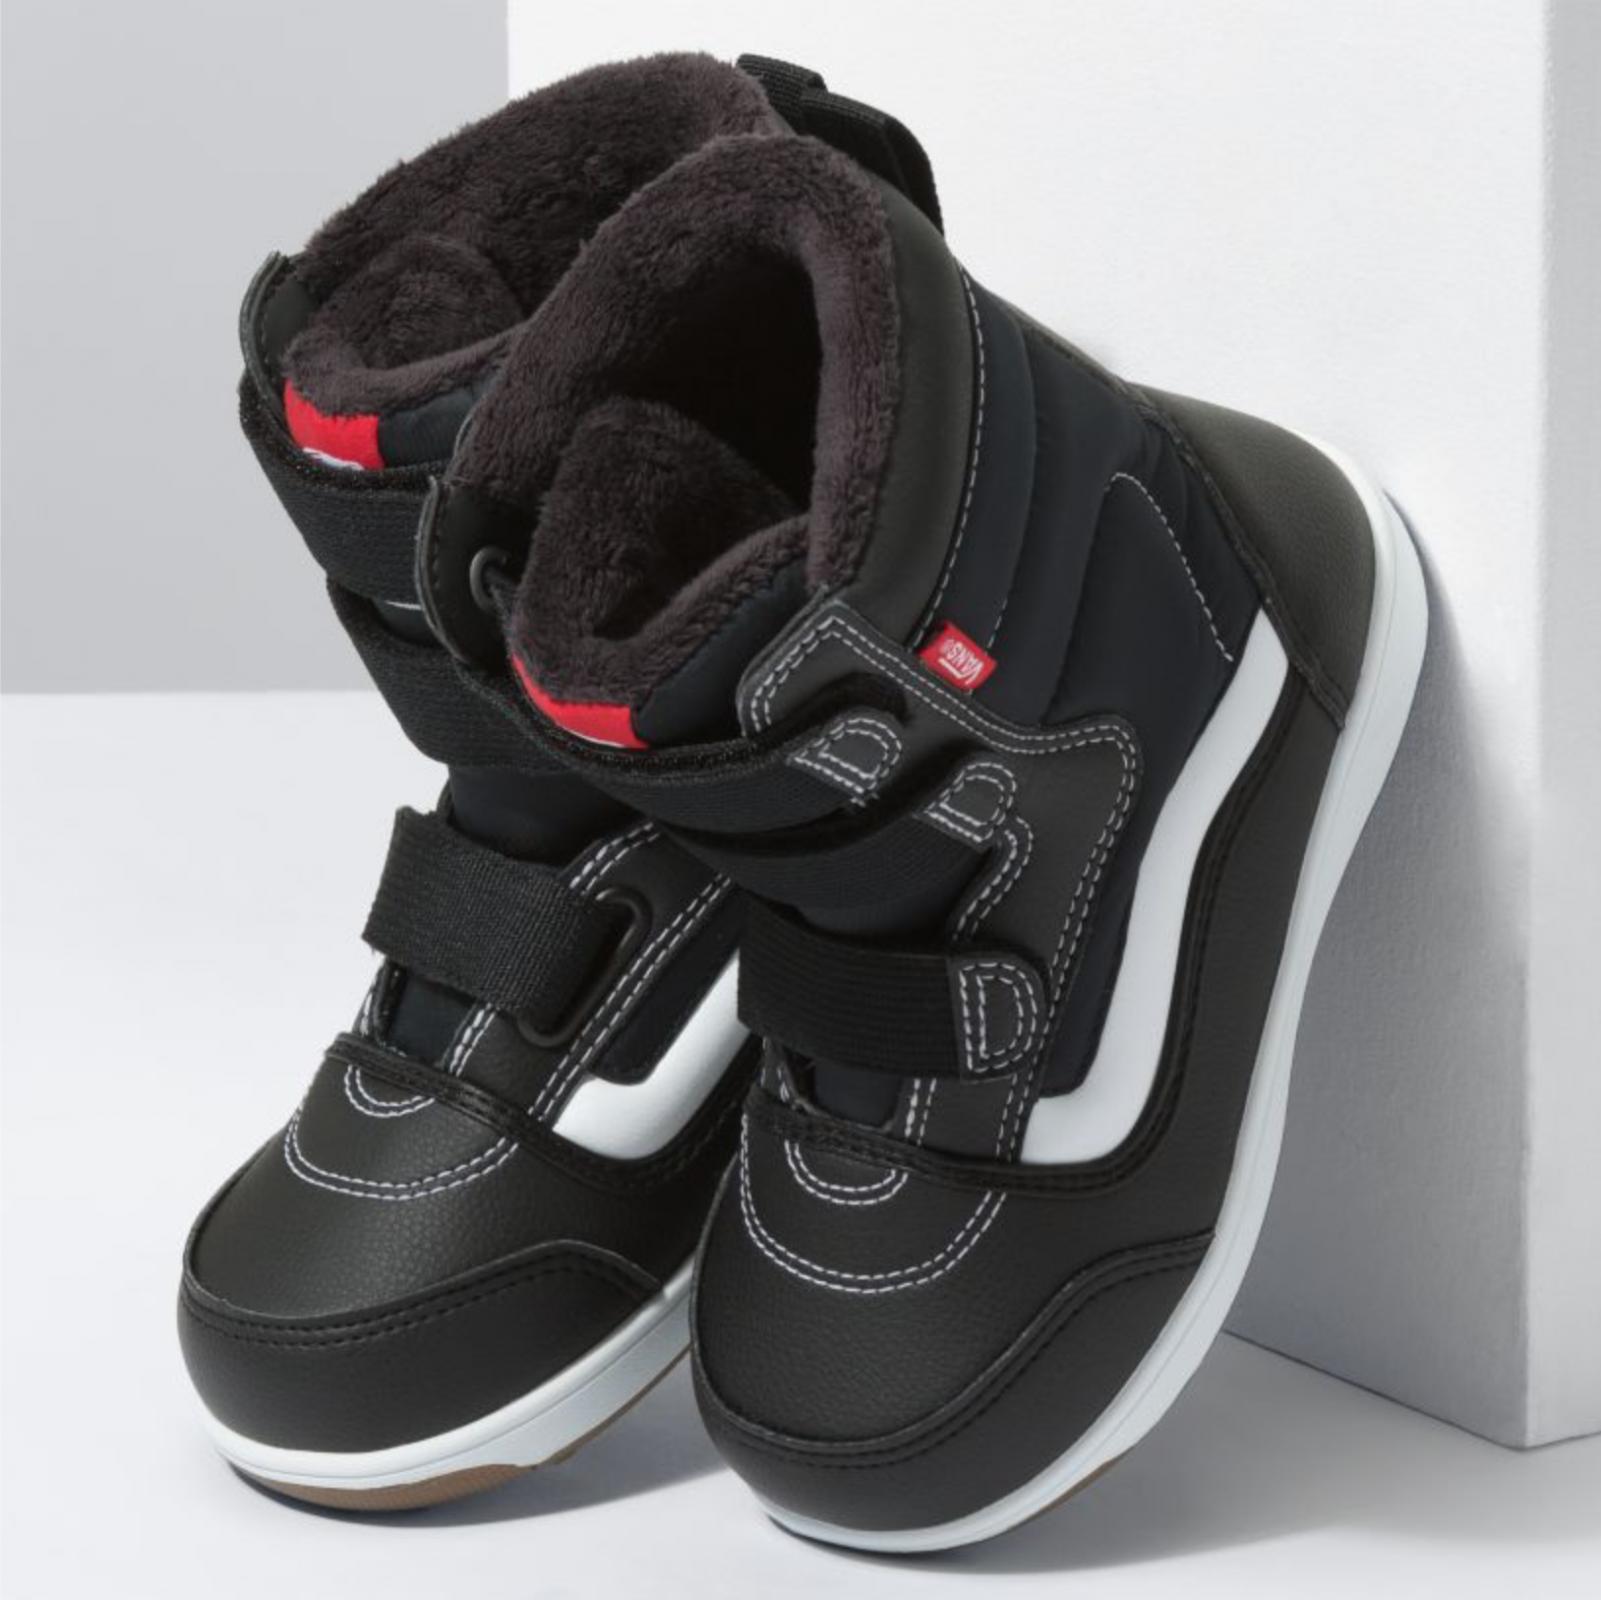 Vans Youth Snow-Cruiser Velcro MTE Boots